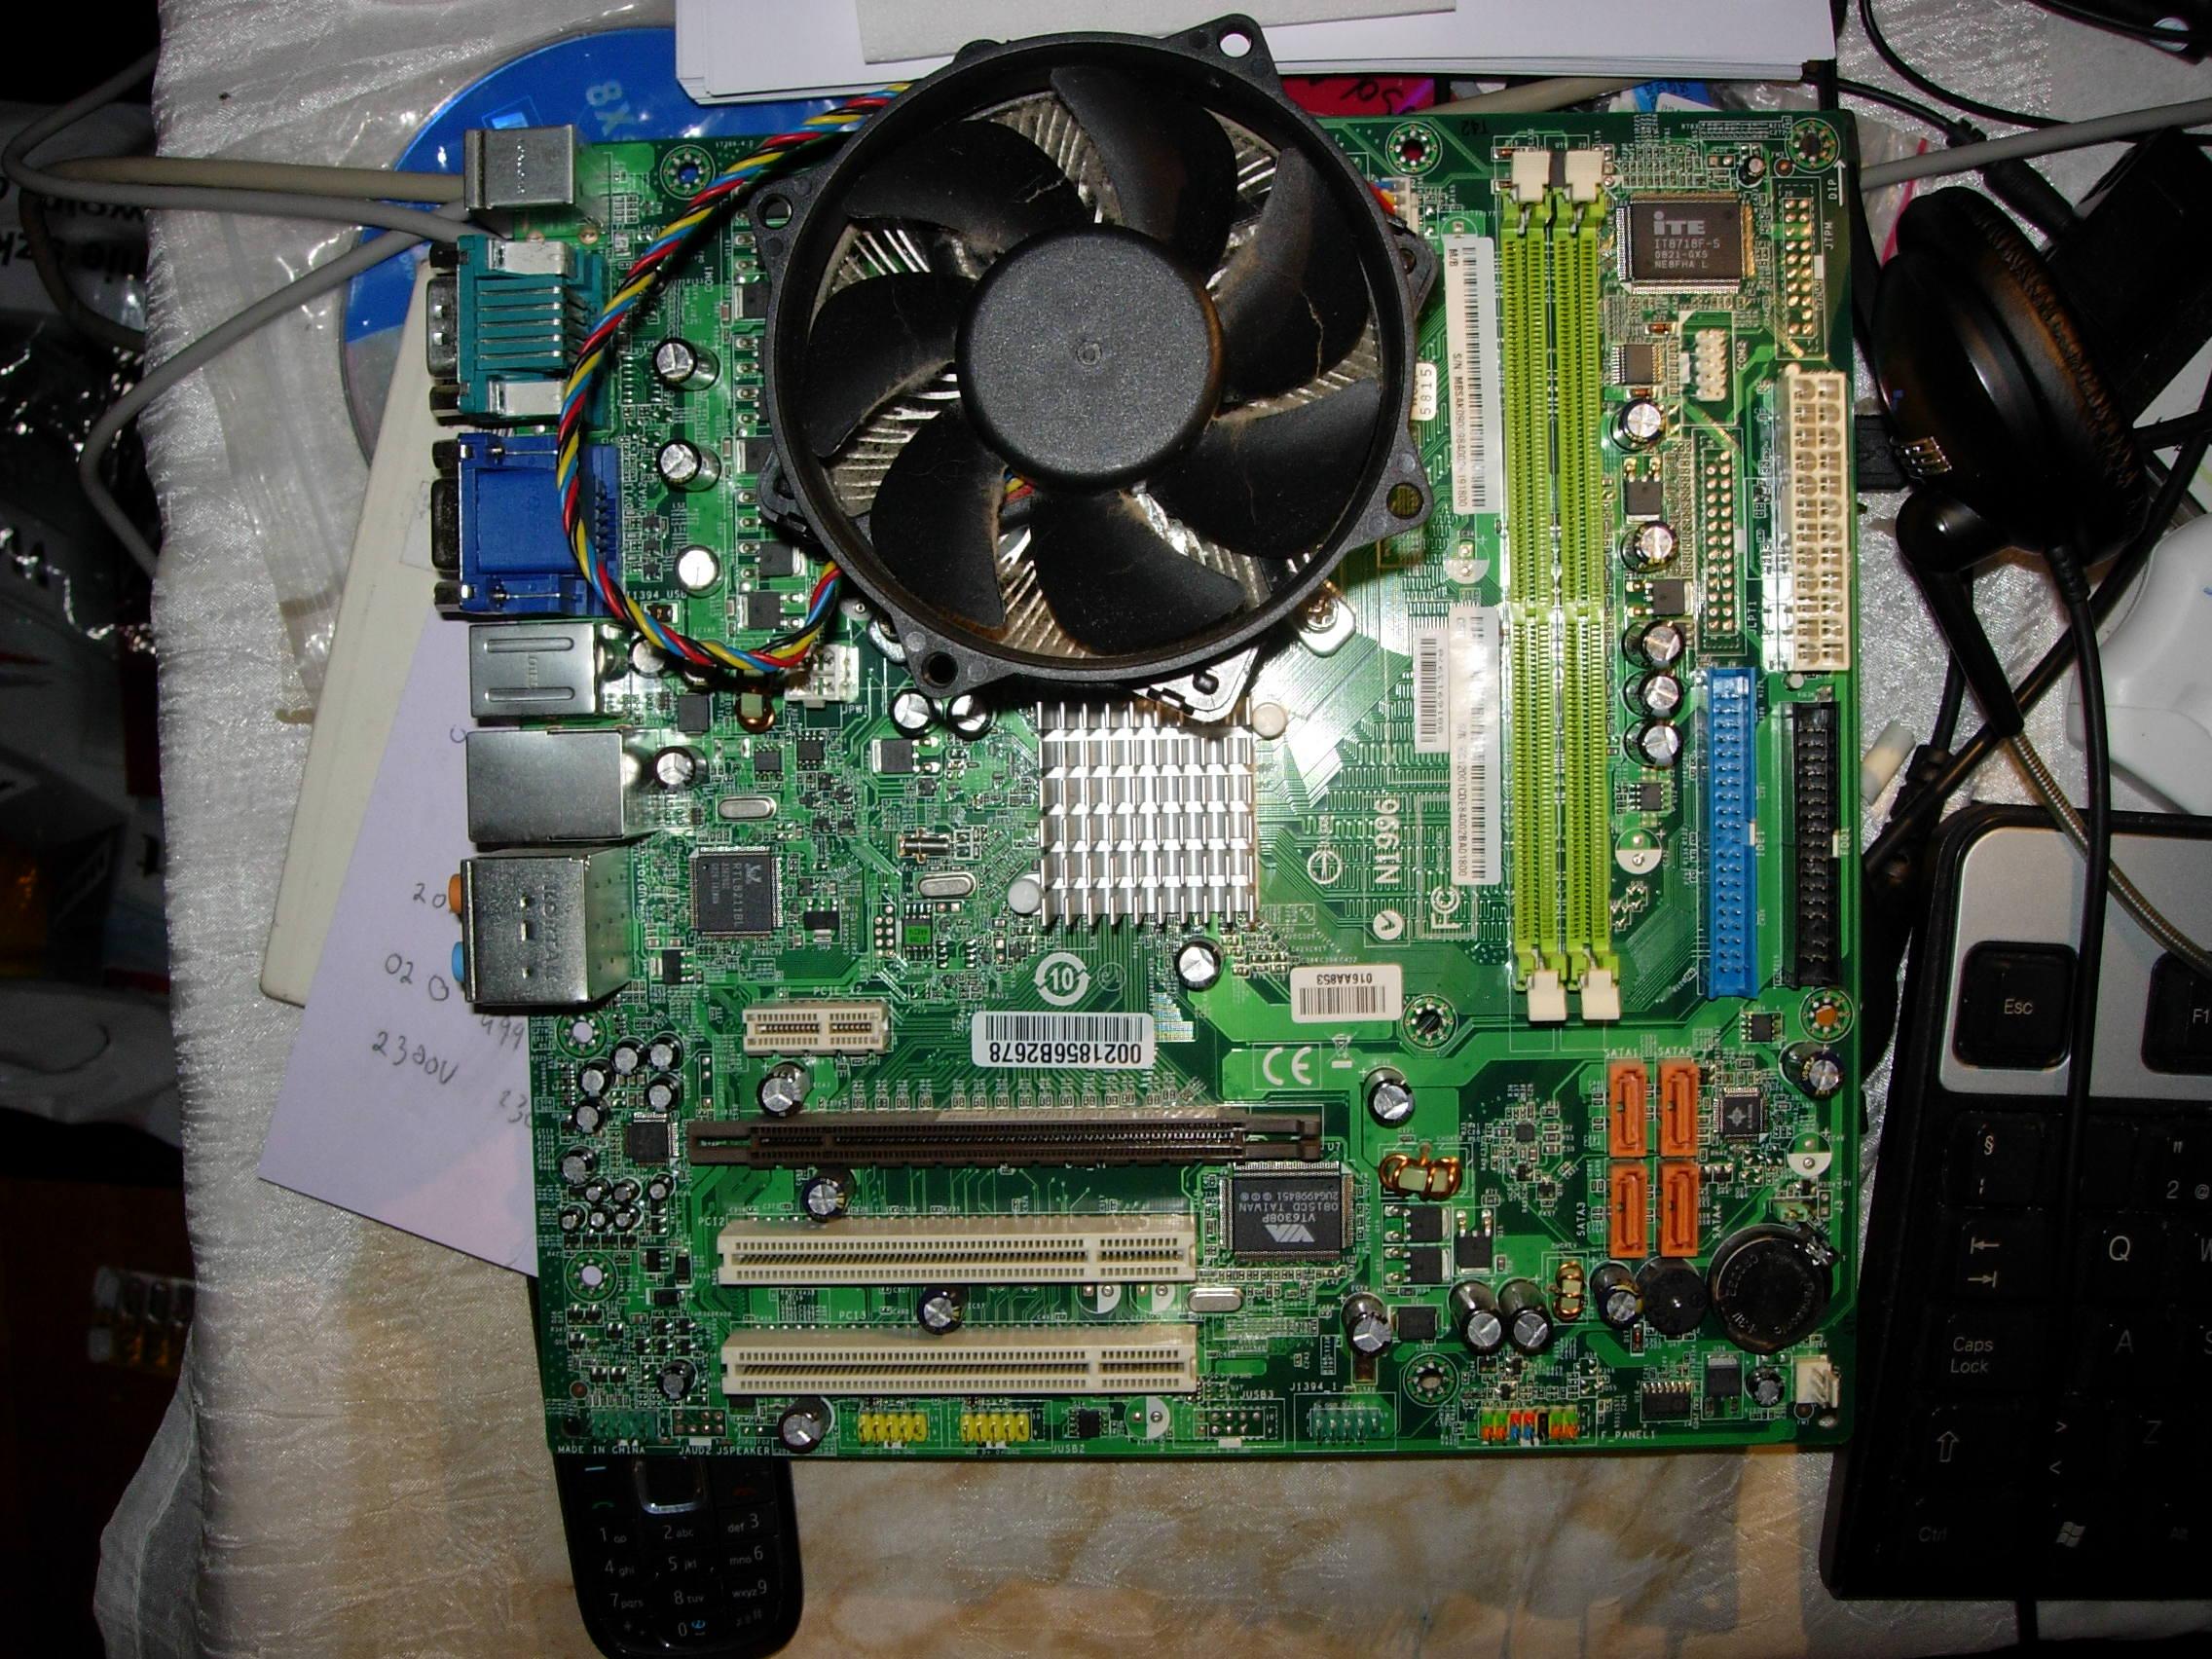 D33008 motherboard